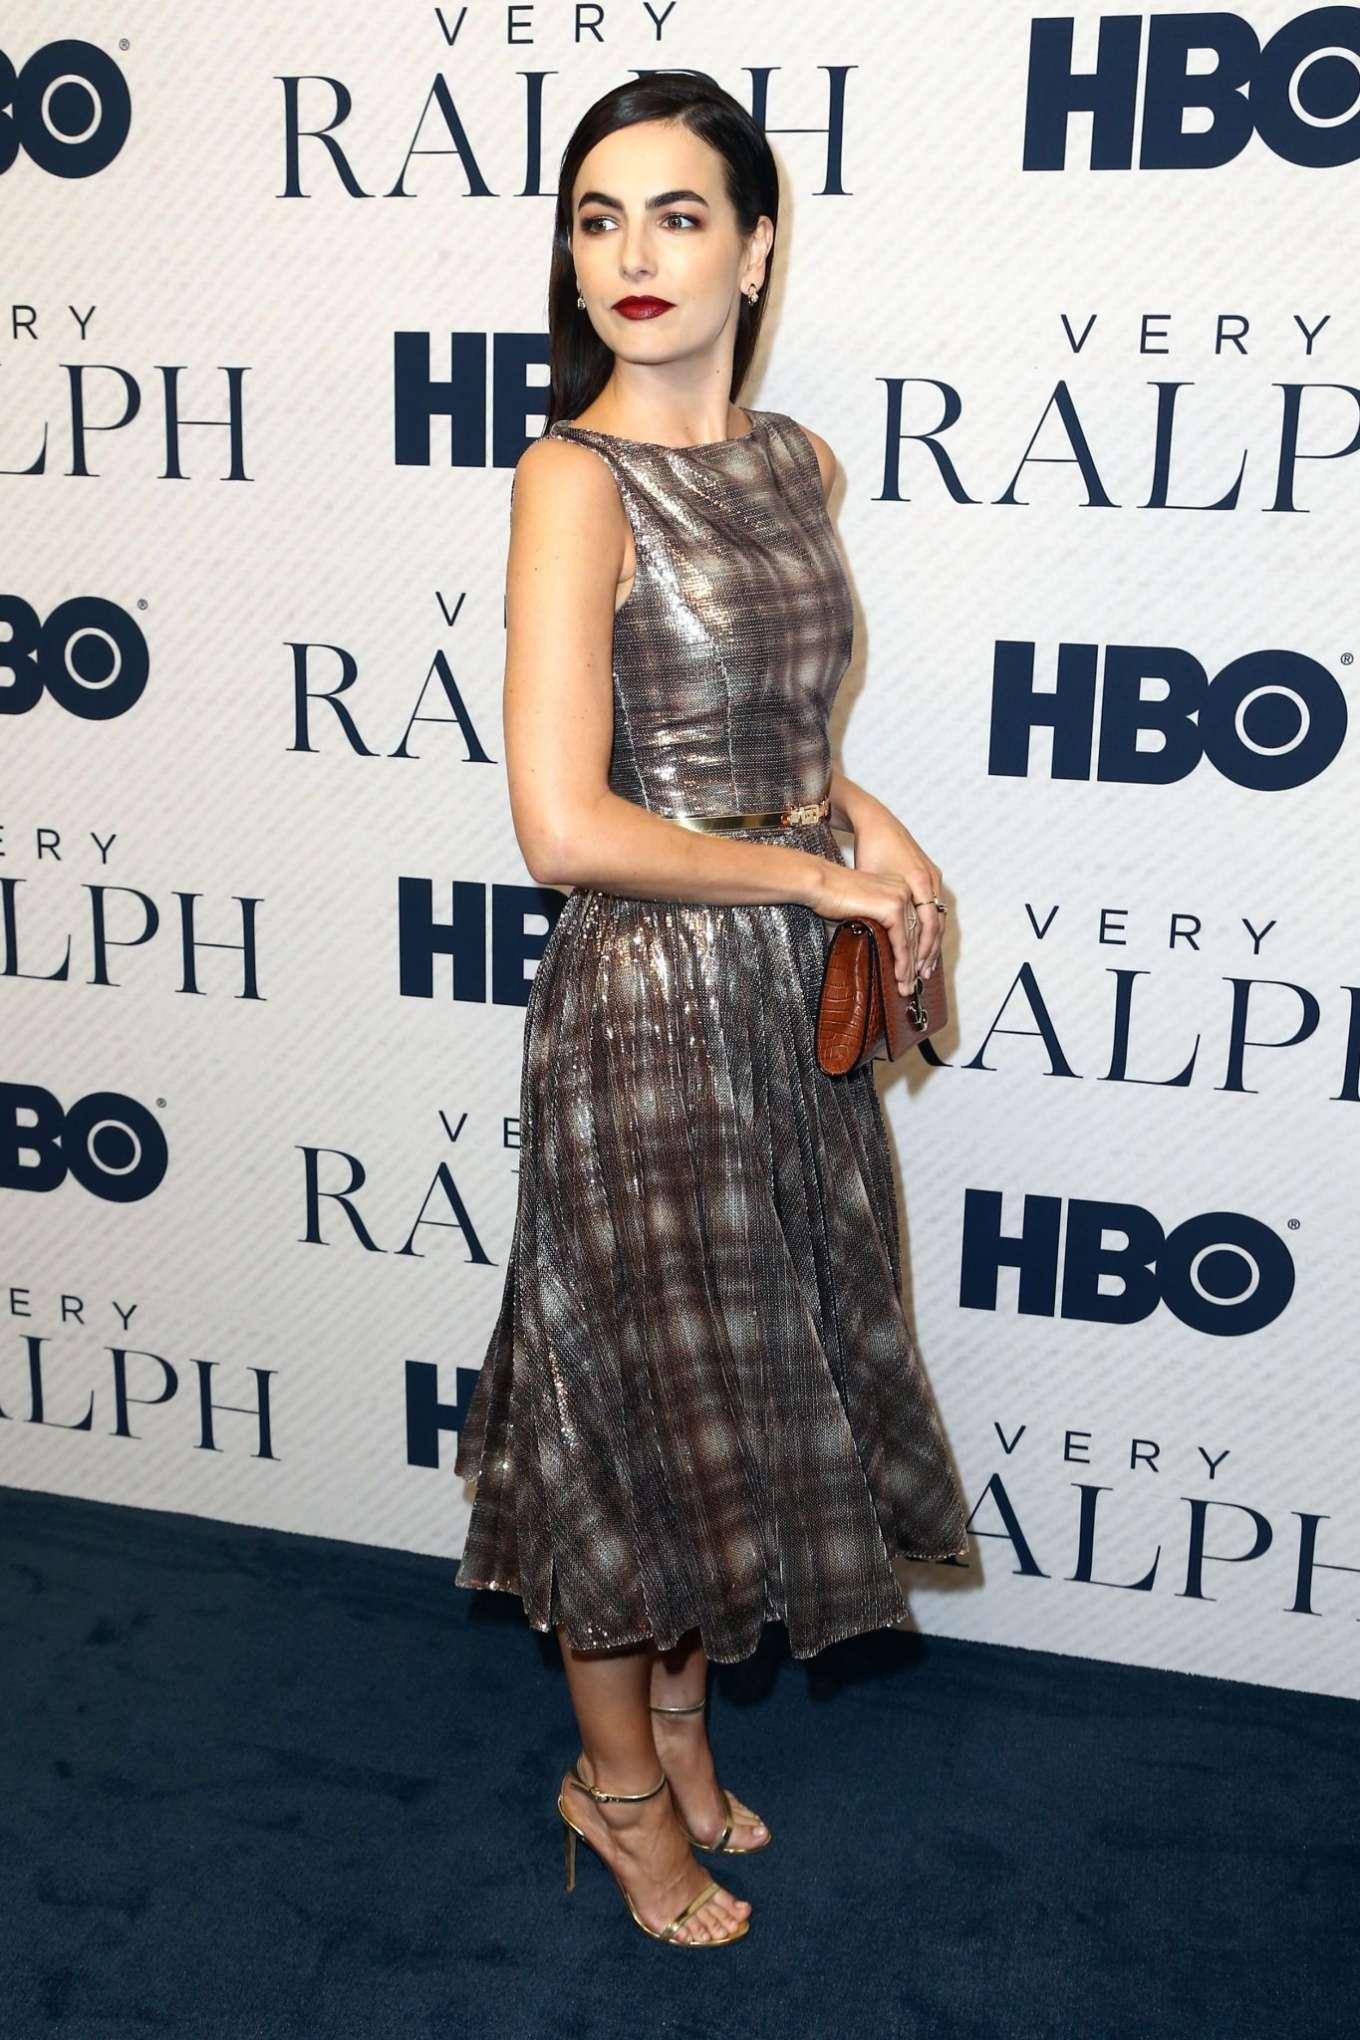 Camilla Belle 2019 : Camilla Belle – Very Ralph Premiere in Beverly Hills-13